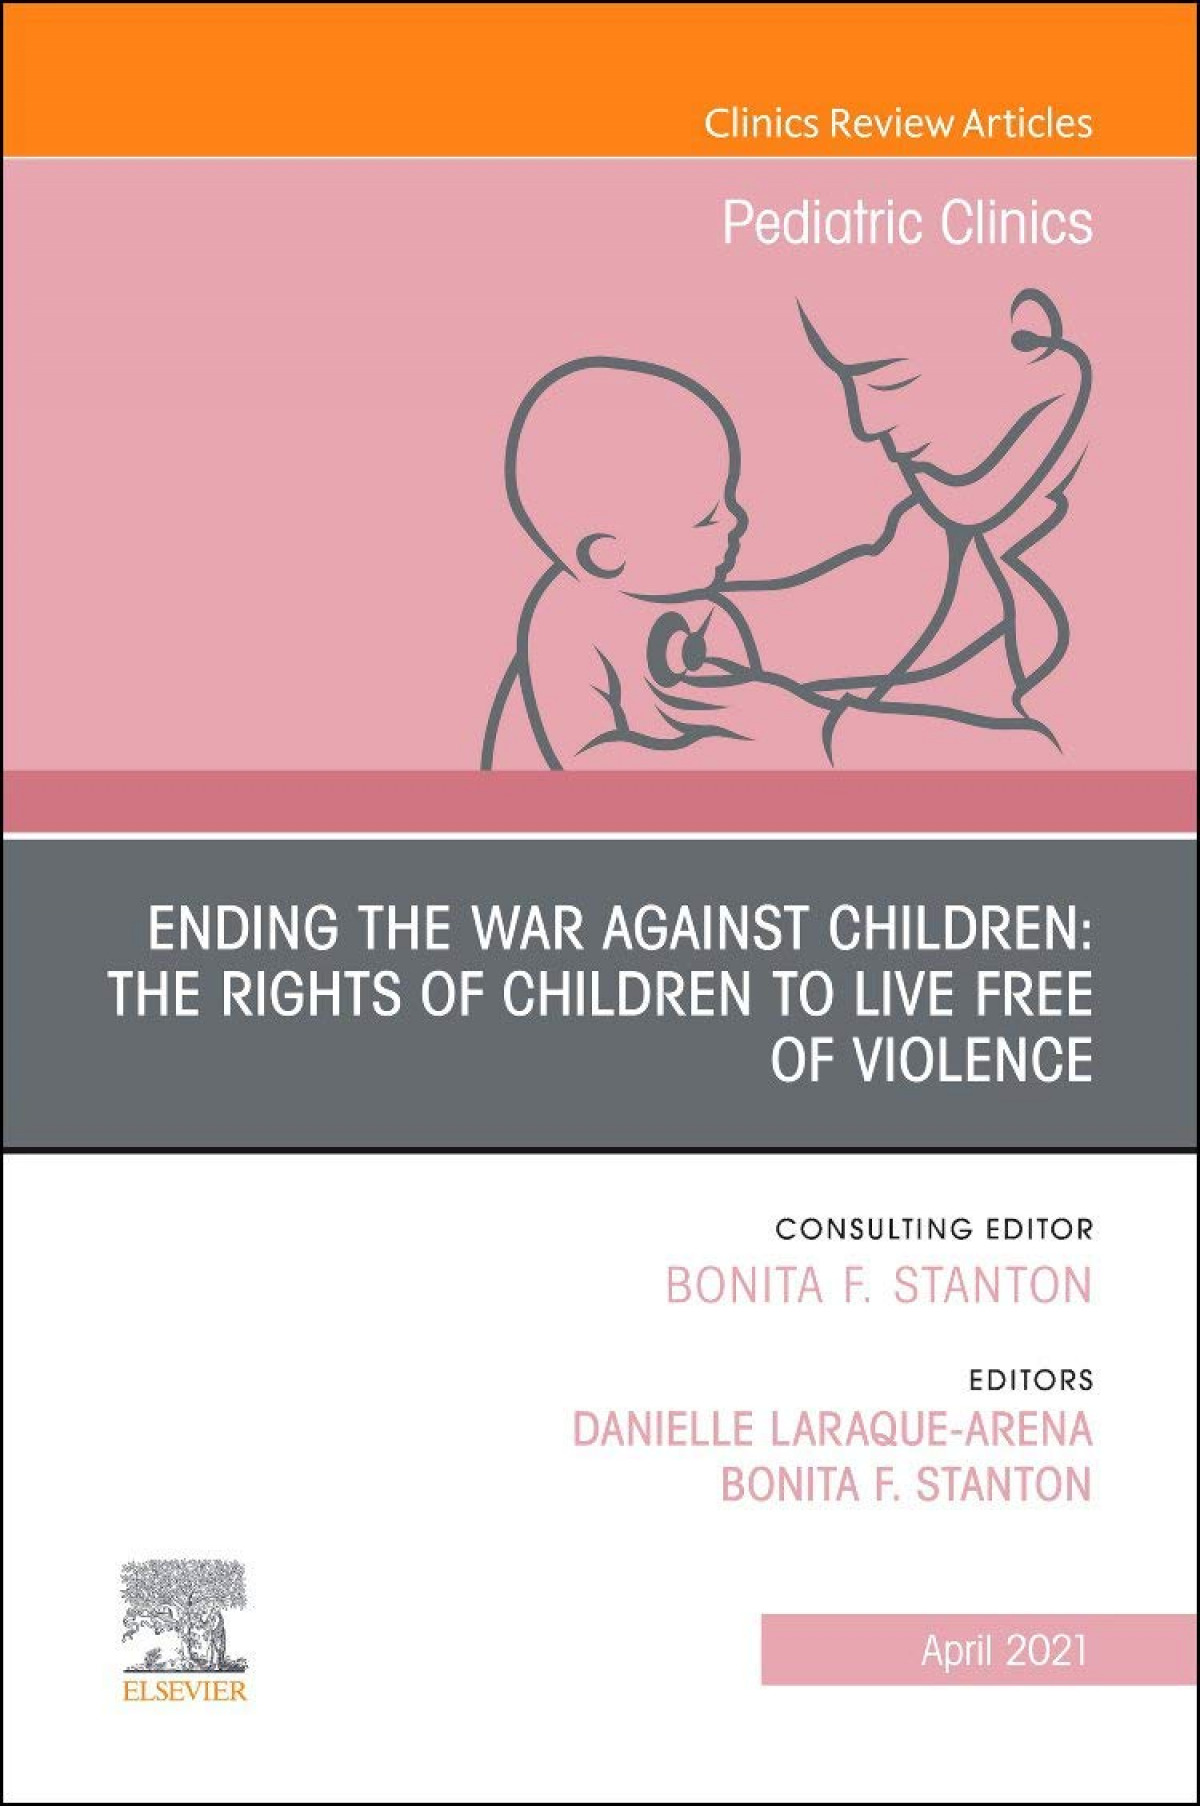 Ending the war against children:rights children live free